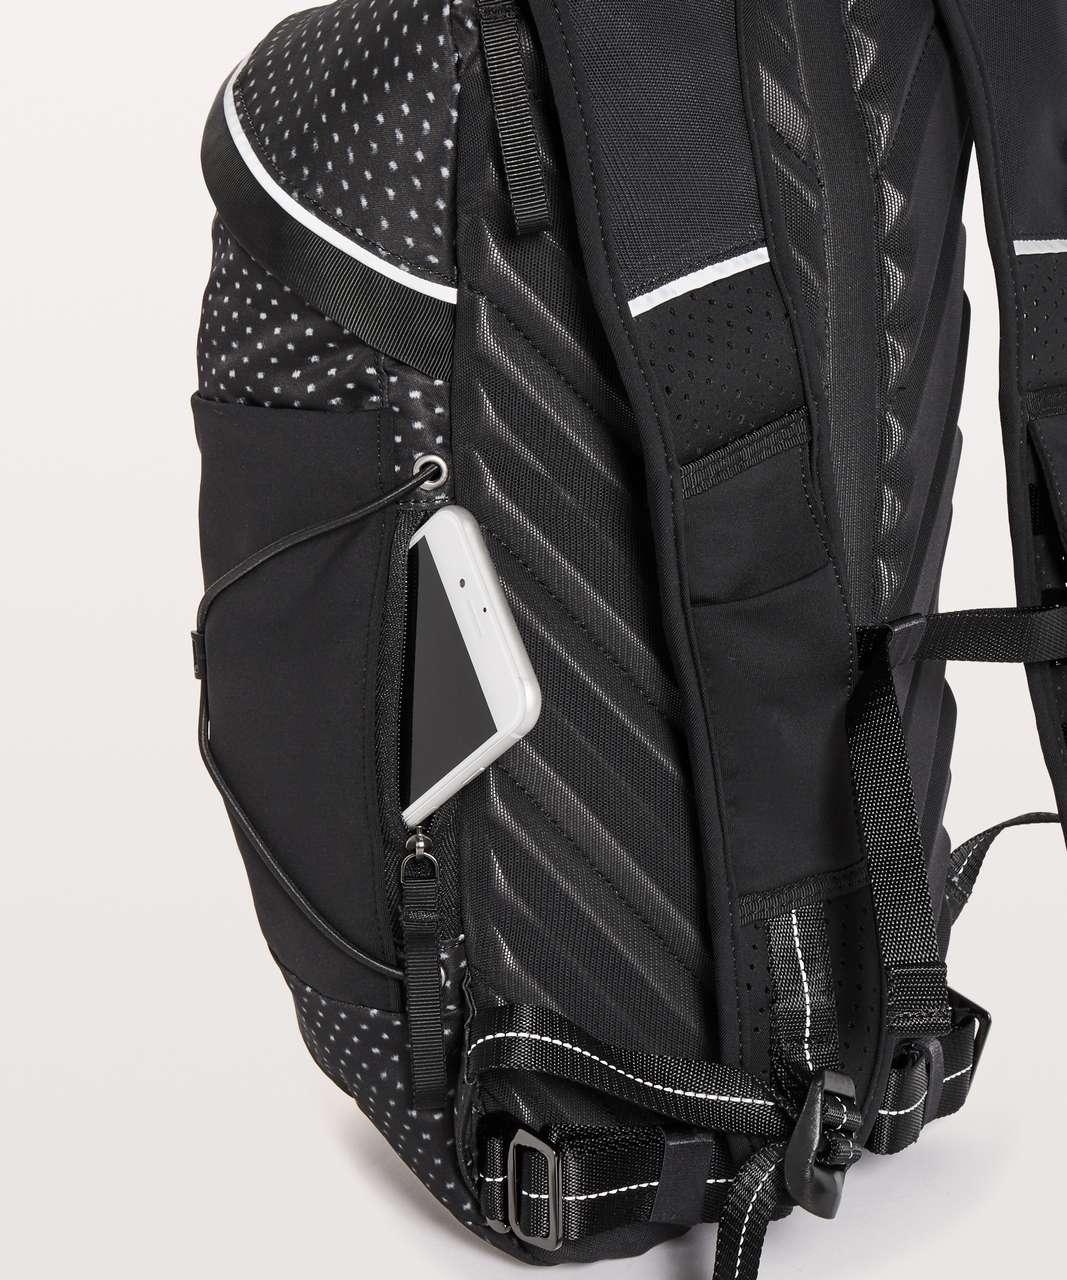 Lululemon Run All Day Backpack II *13L - Ikat Needle Dot Grey Black / Black